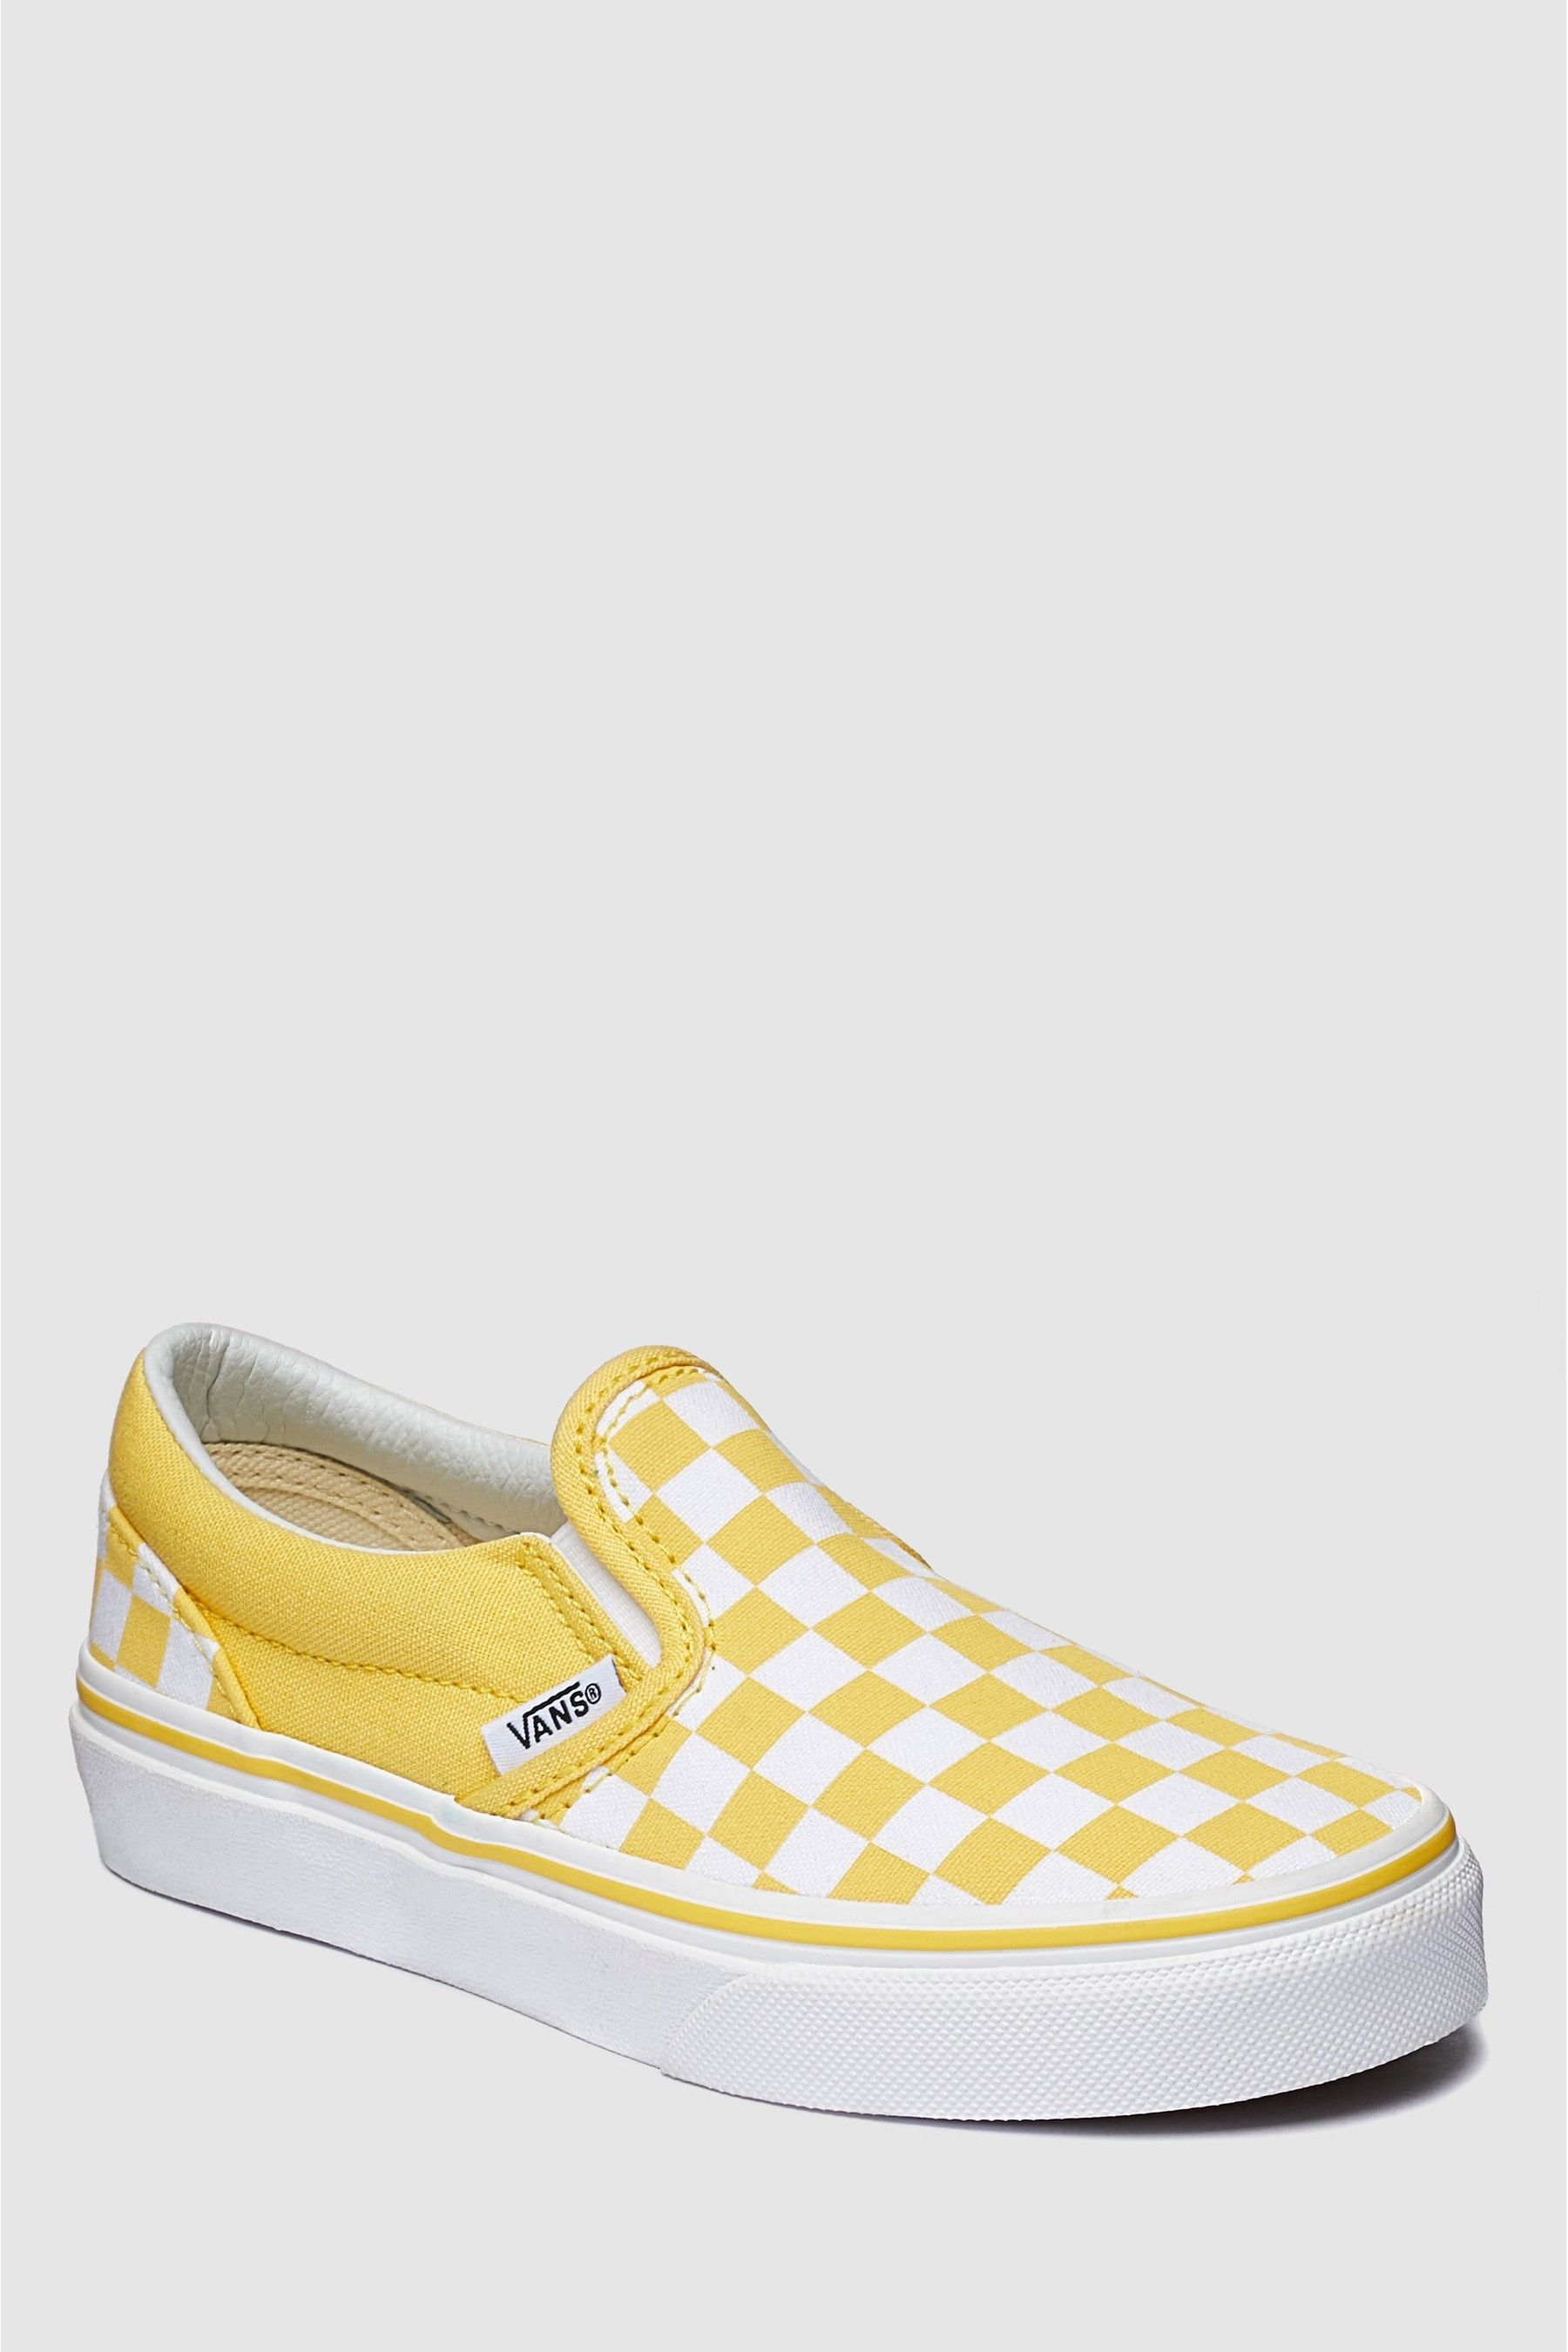 Boys Vans Yellow Check Slip-On Youth